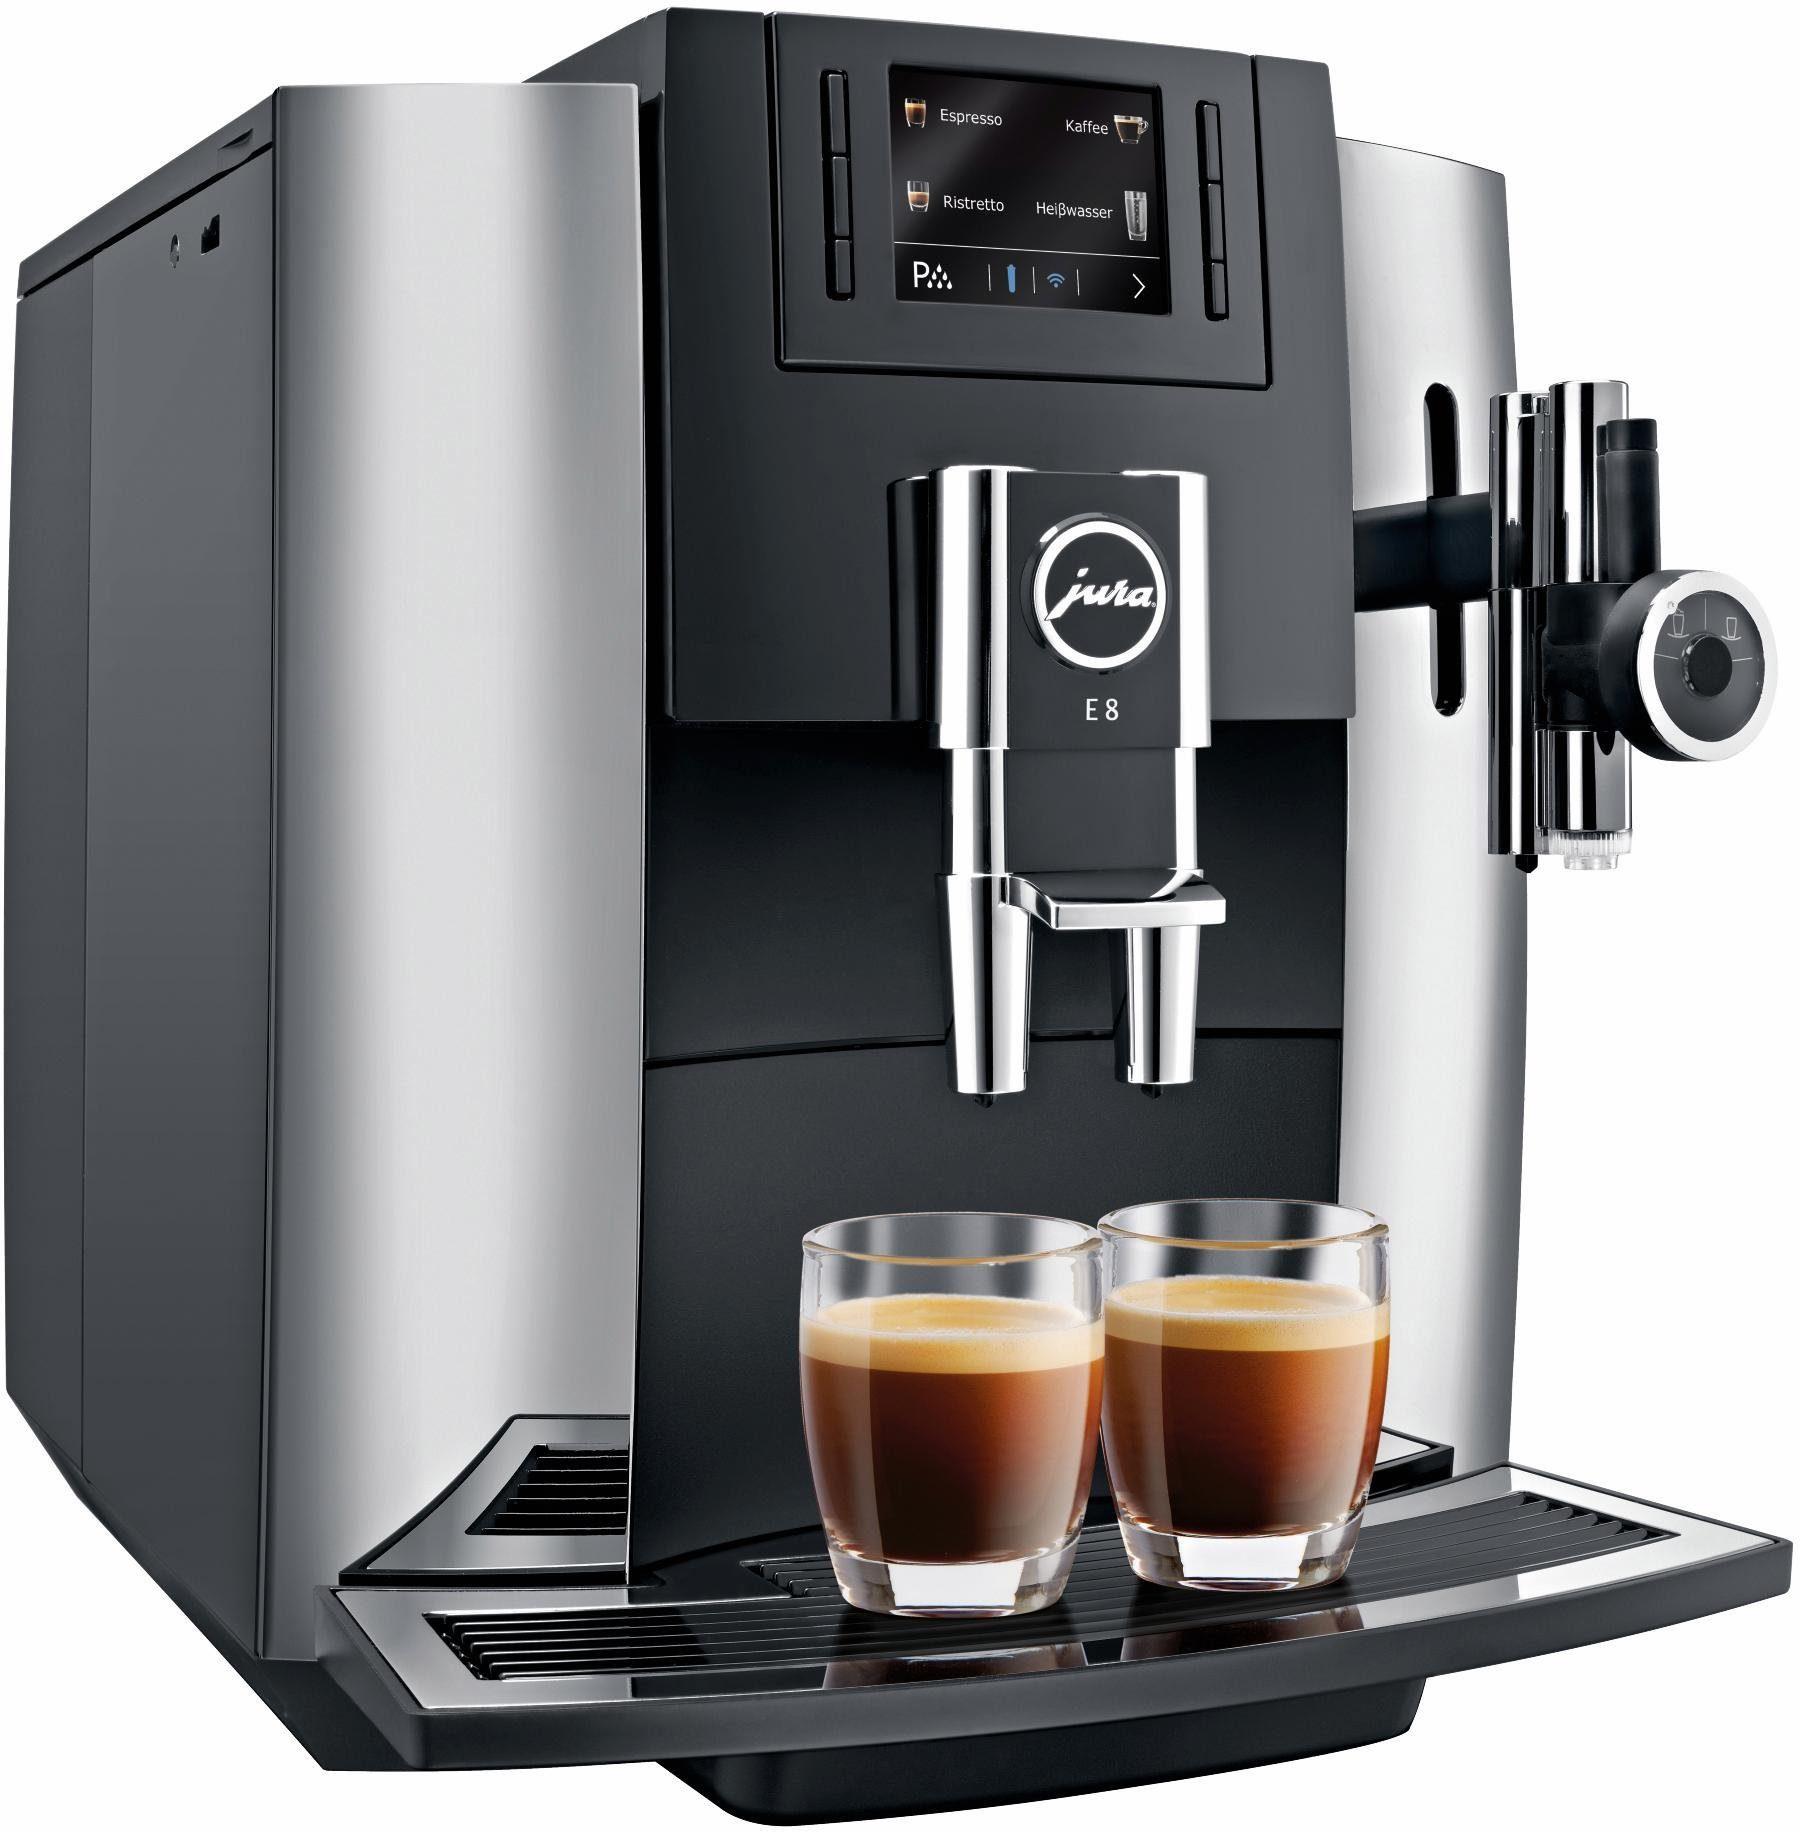 Jura Espresso-/Kaffee-Vollautomat E8 Chrom, 15 bar